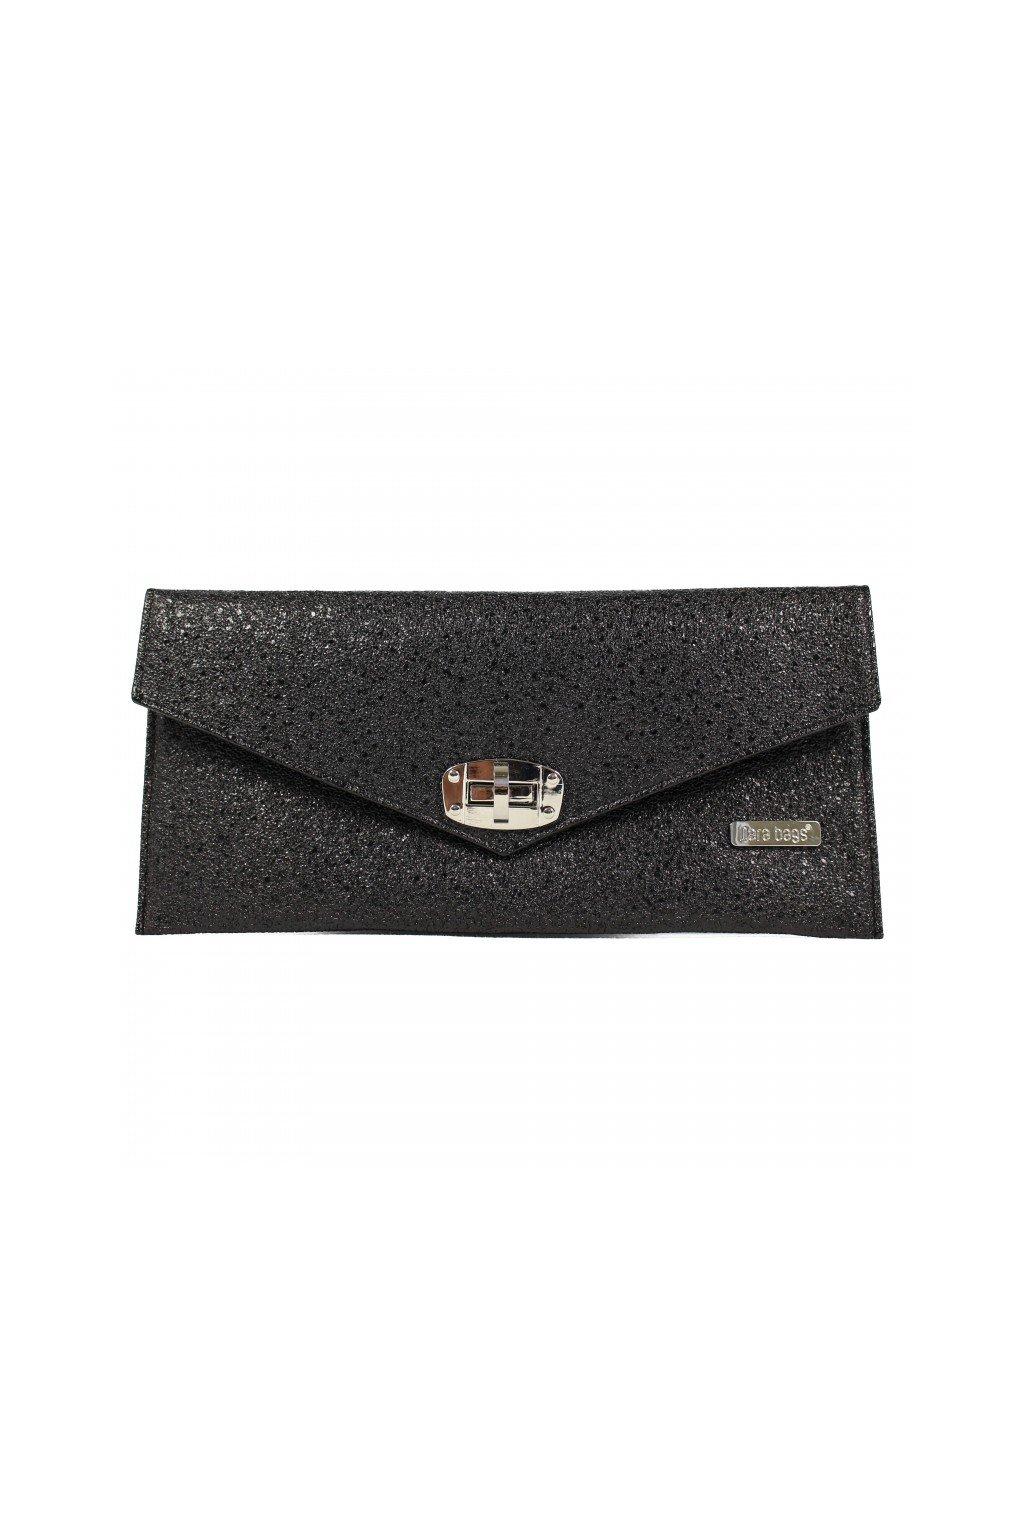 Mala trpytiva kabelka Malibu Classy Dara bags cerna 1